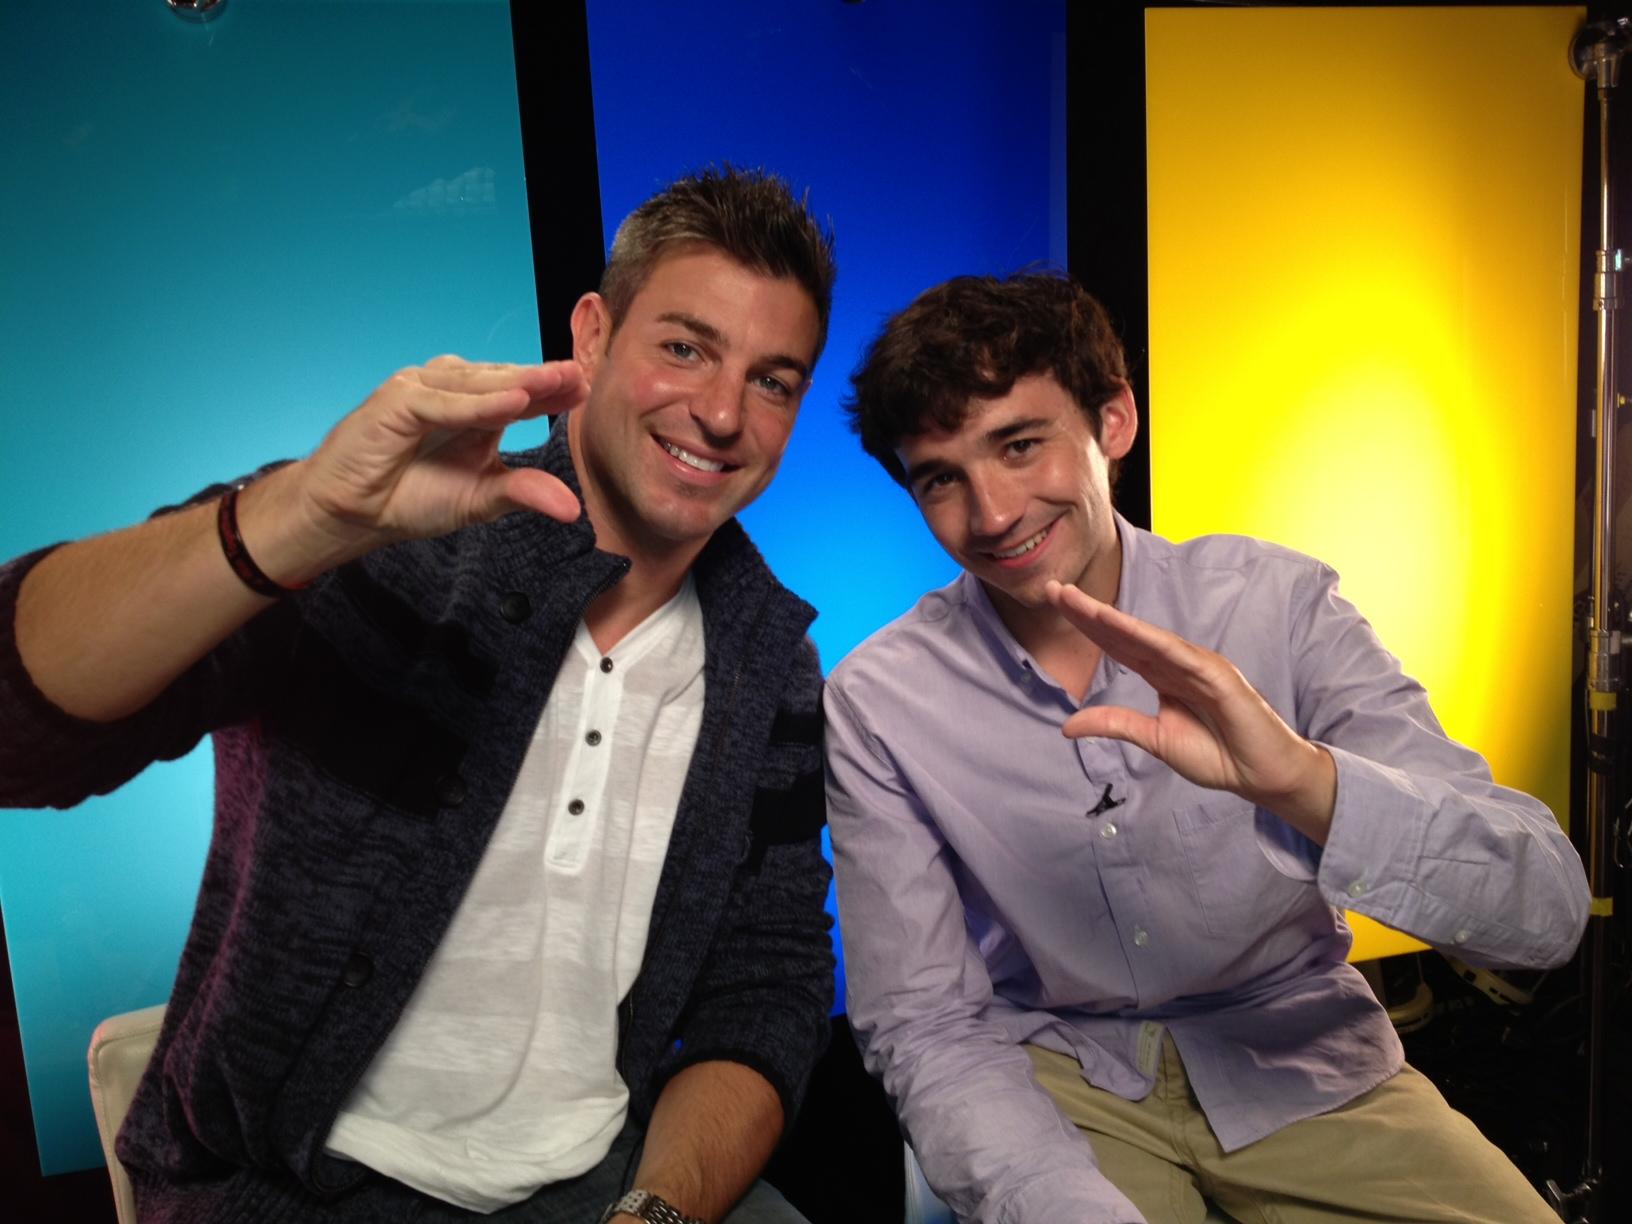 Jeff and Ian